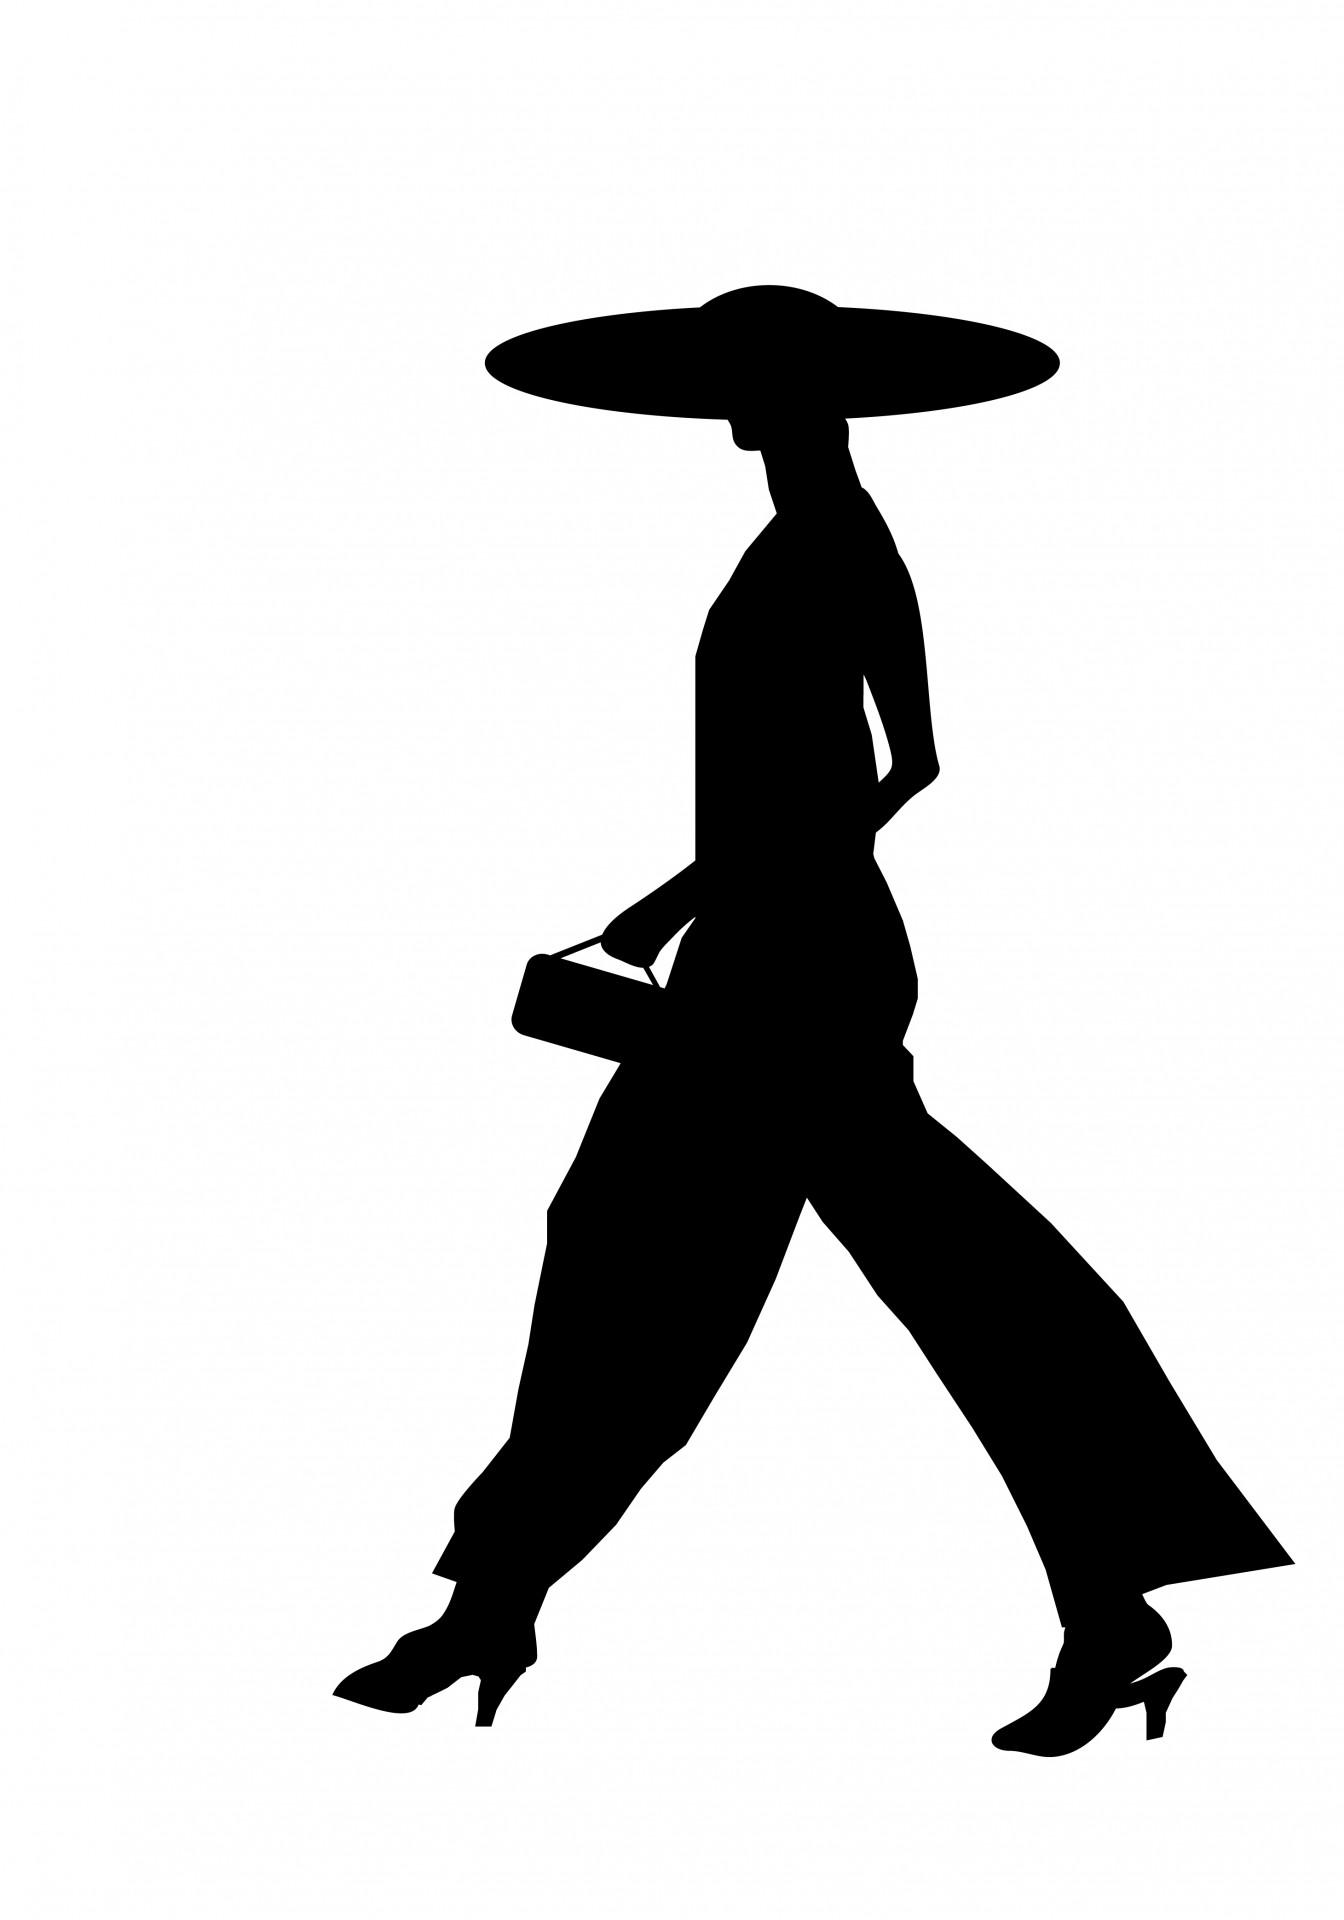 1344x1920 Woman Walking Silhouette Free Stock Photo